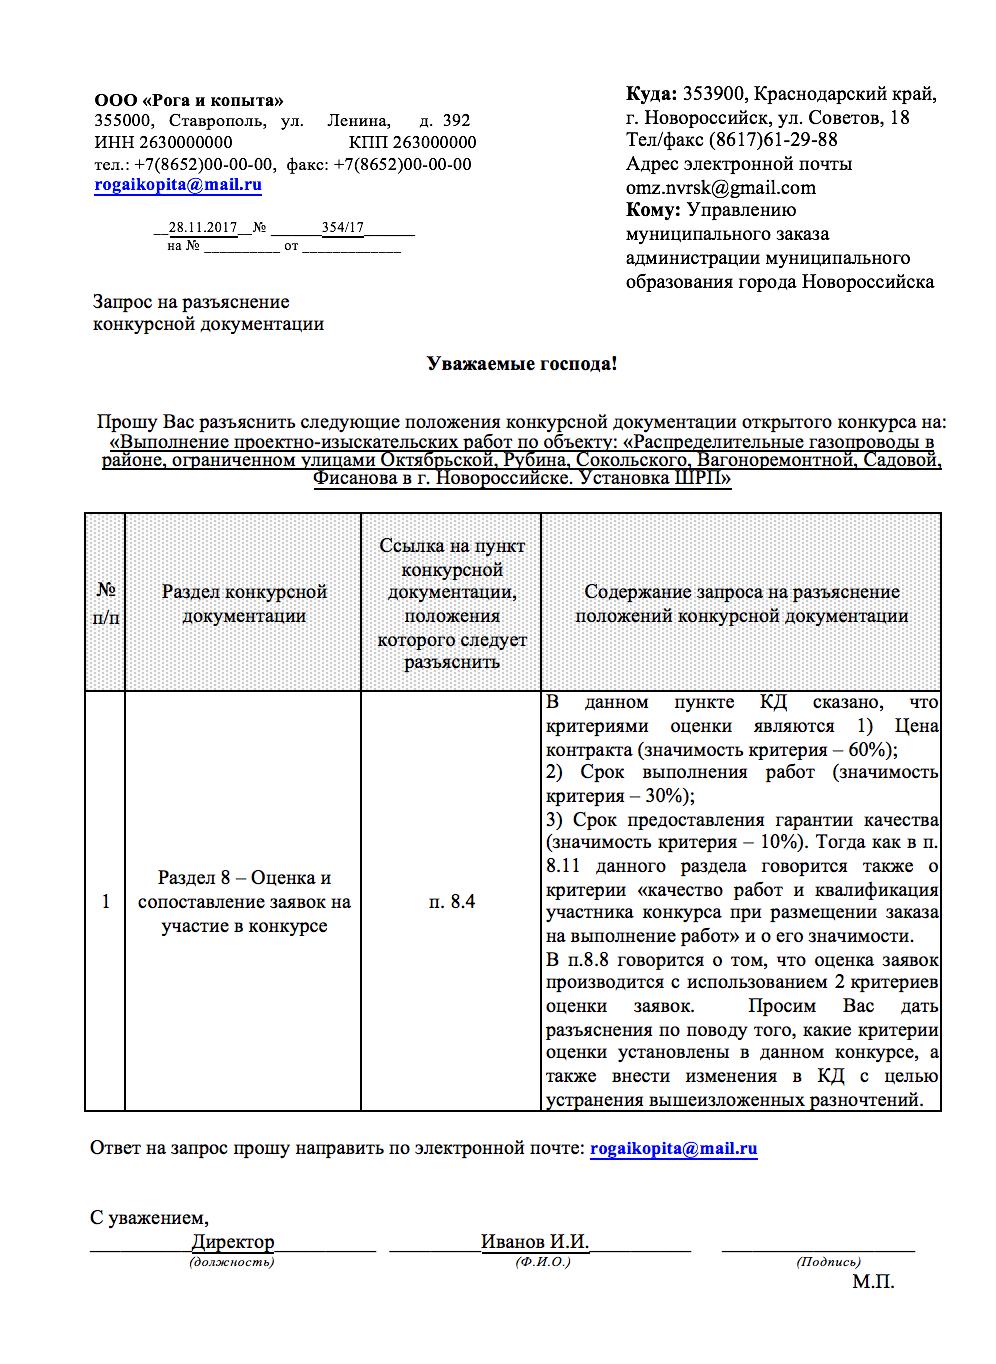 образец запроса по 44-ФЗ